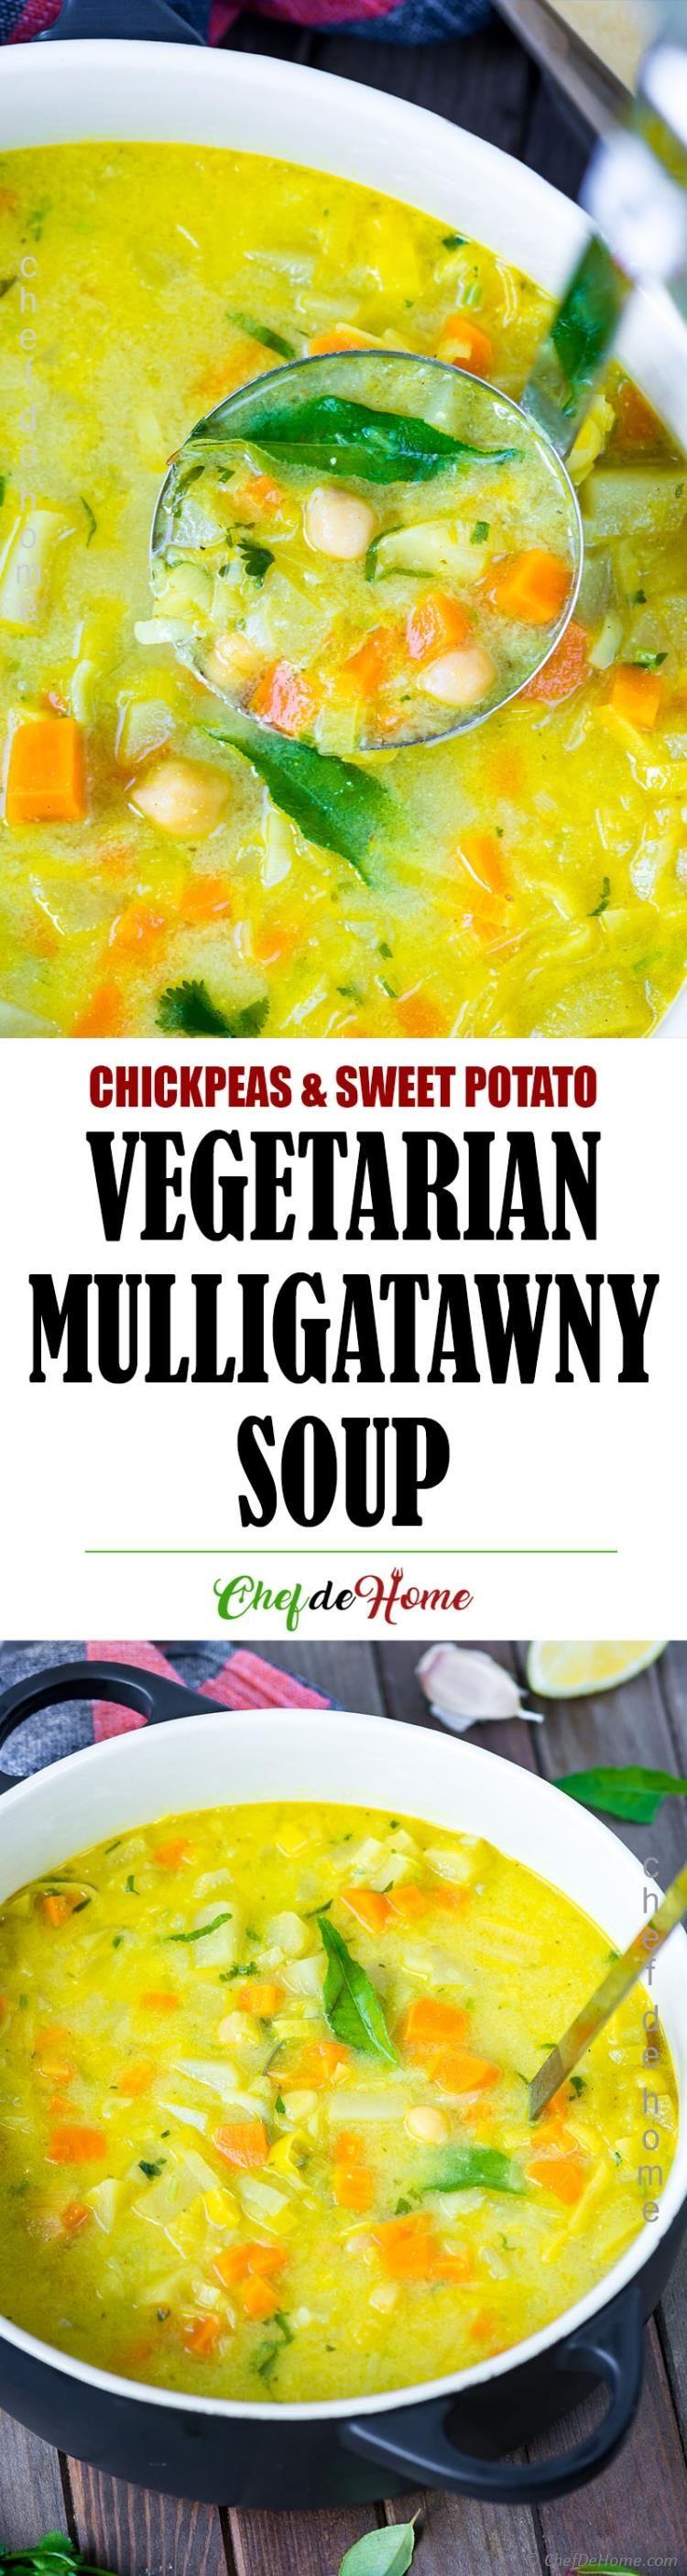 Vegetarian Mulligatawny Soup Recipe   ChefDeHome.com